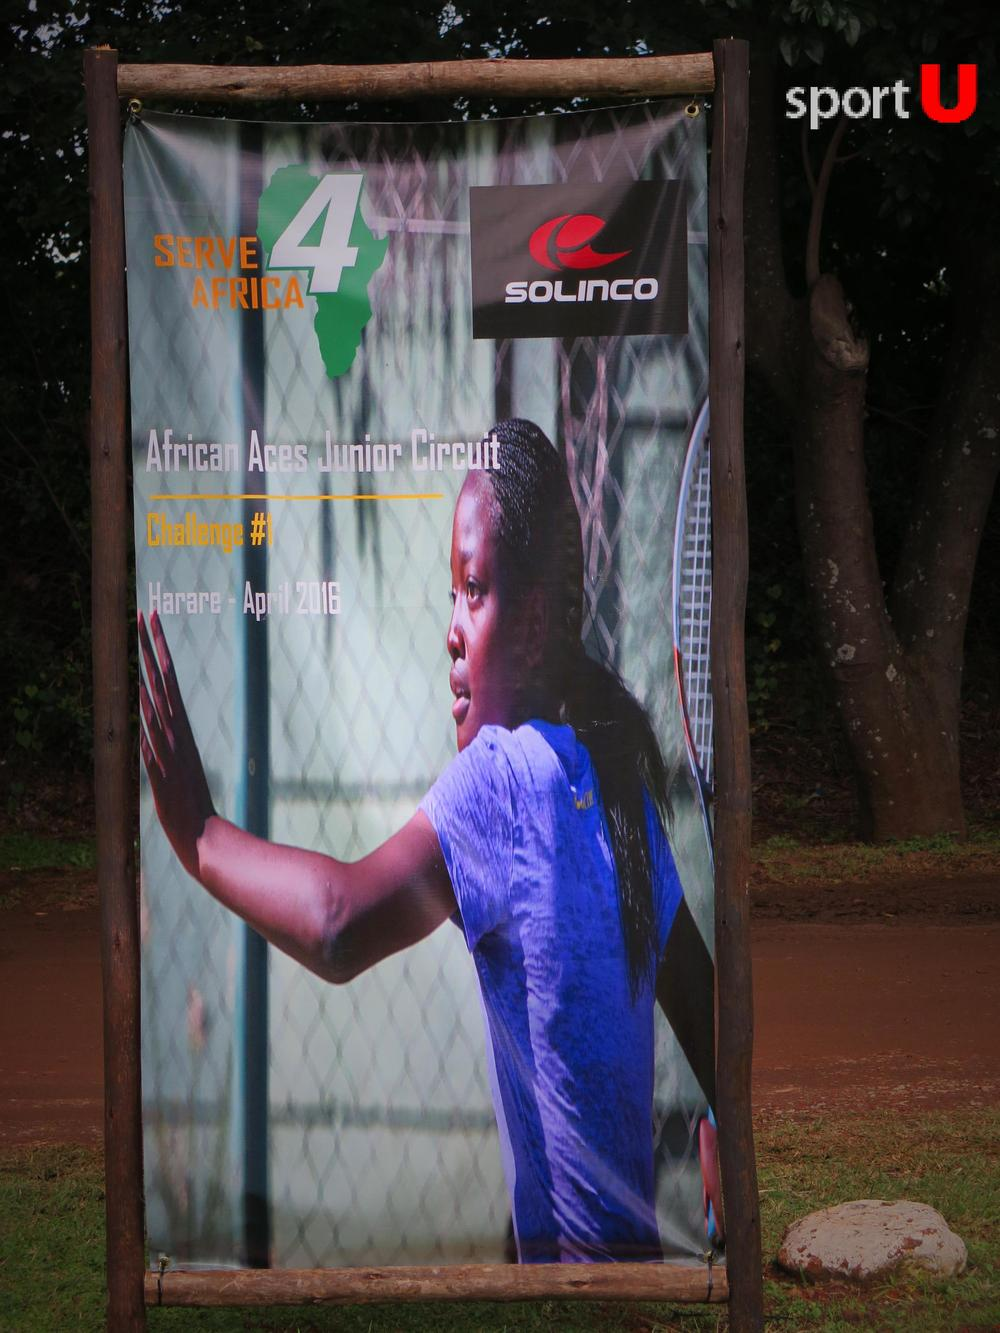 AfricanAces81. sportU.jpg